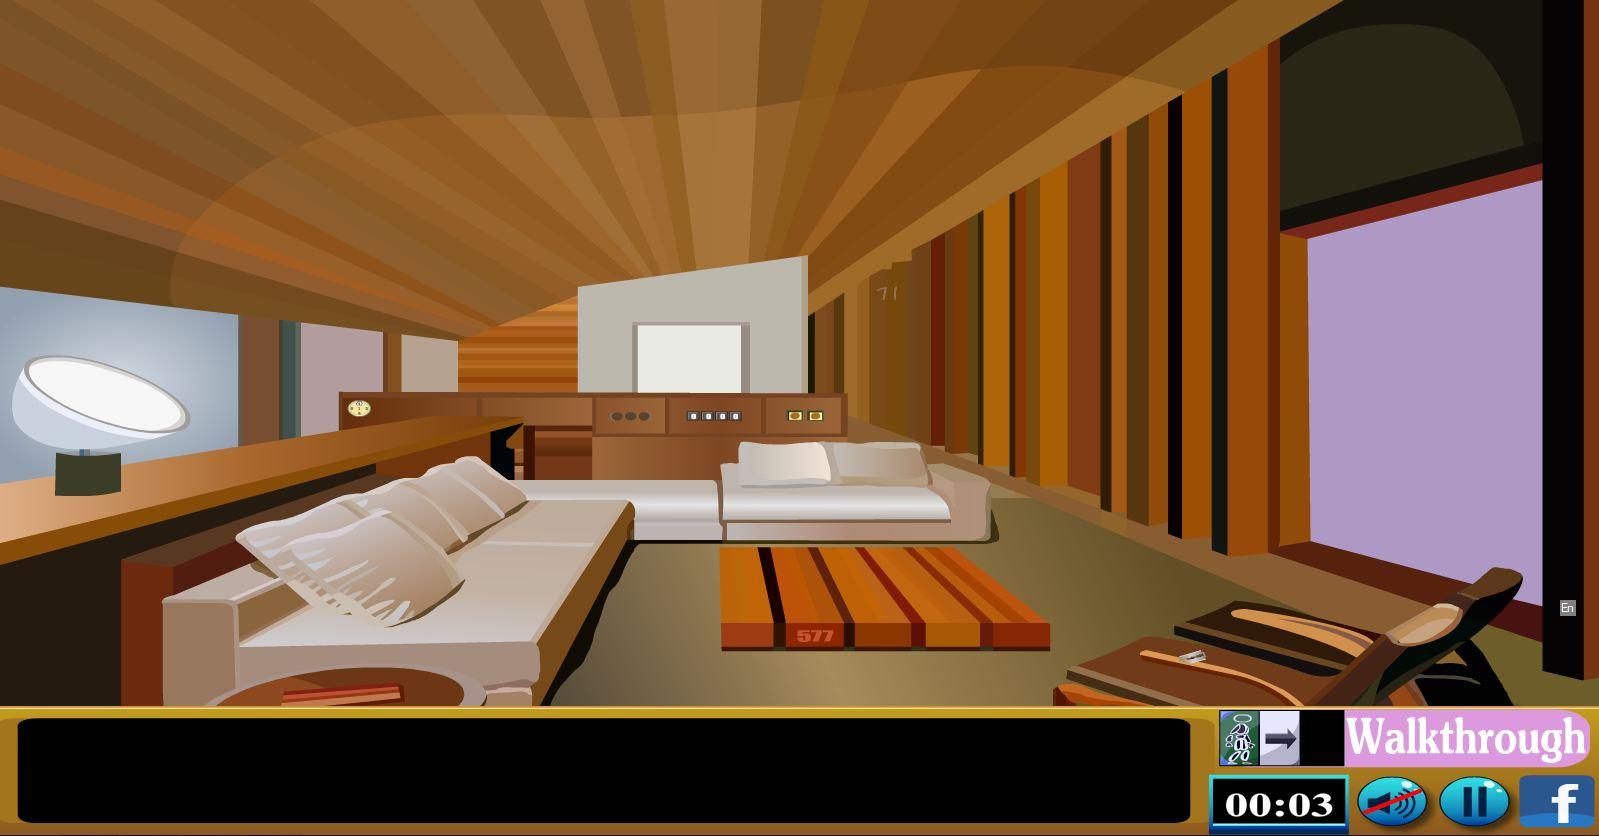 Flash Modern Wooden Room Escape : 1417508660b671e0c6f9edebd91b161faa72dcd10a from flashroom.ru size 1599 x 836 jpeg 114kB